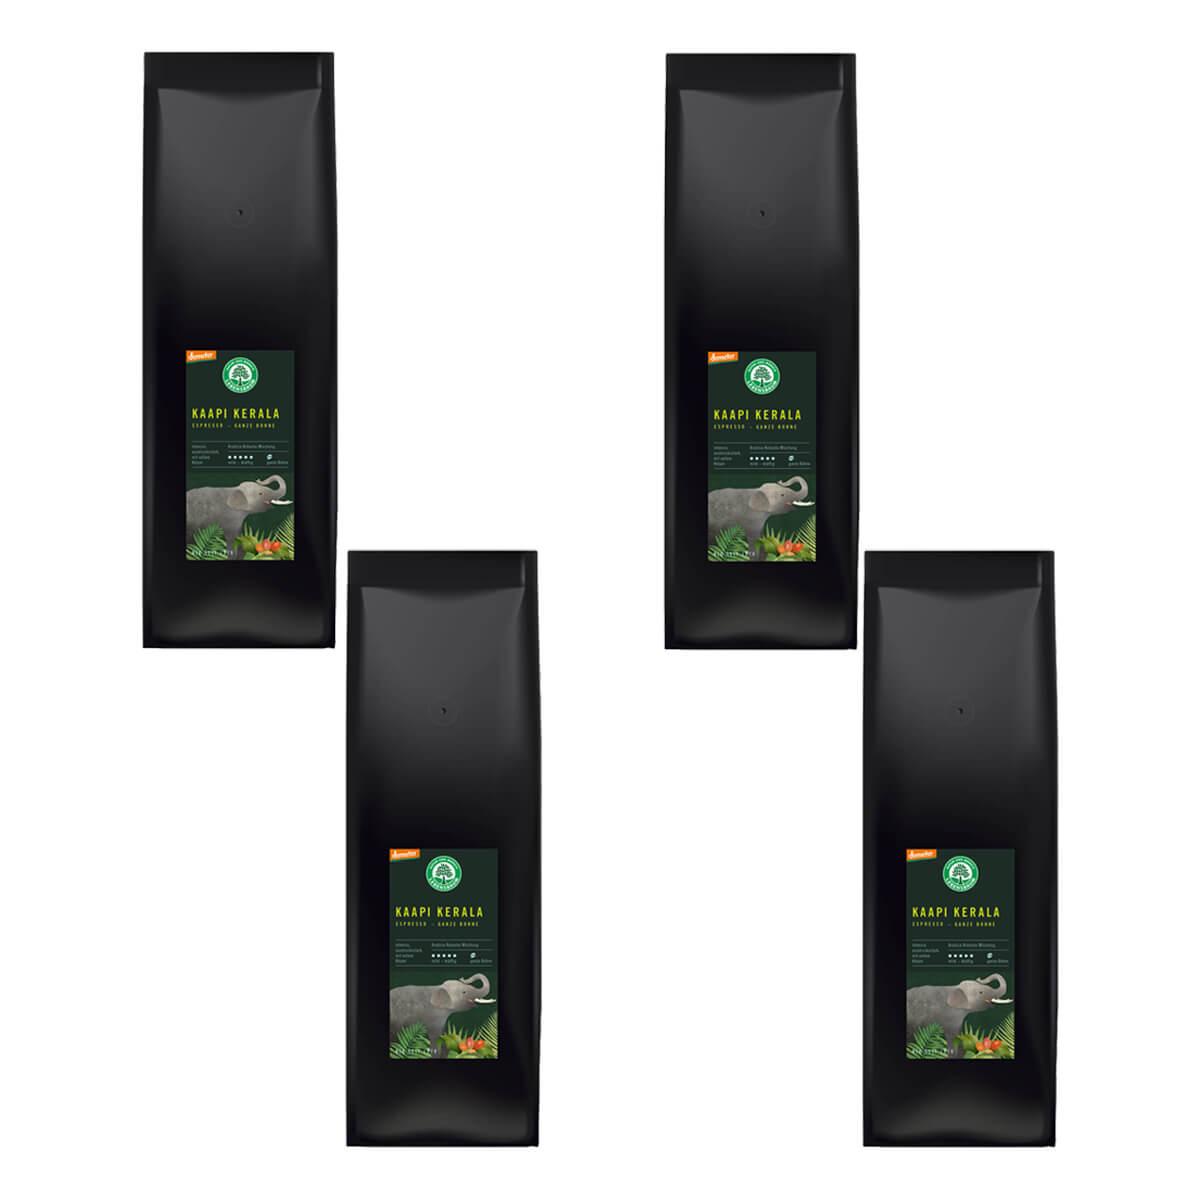 lebensbaum-kaapi-kerala-espresso-bohne-1